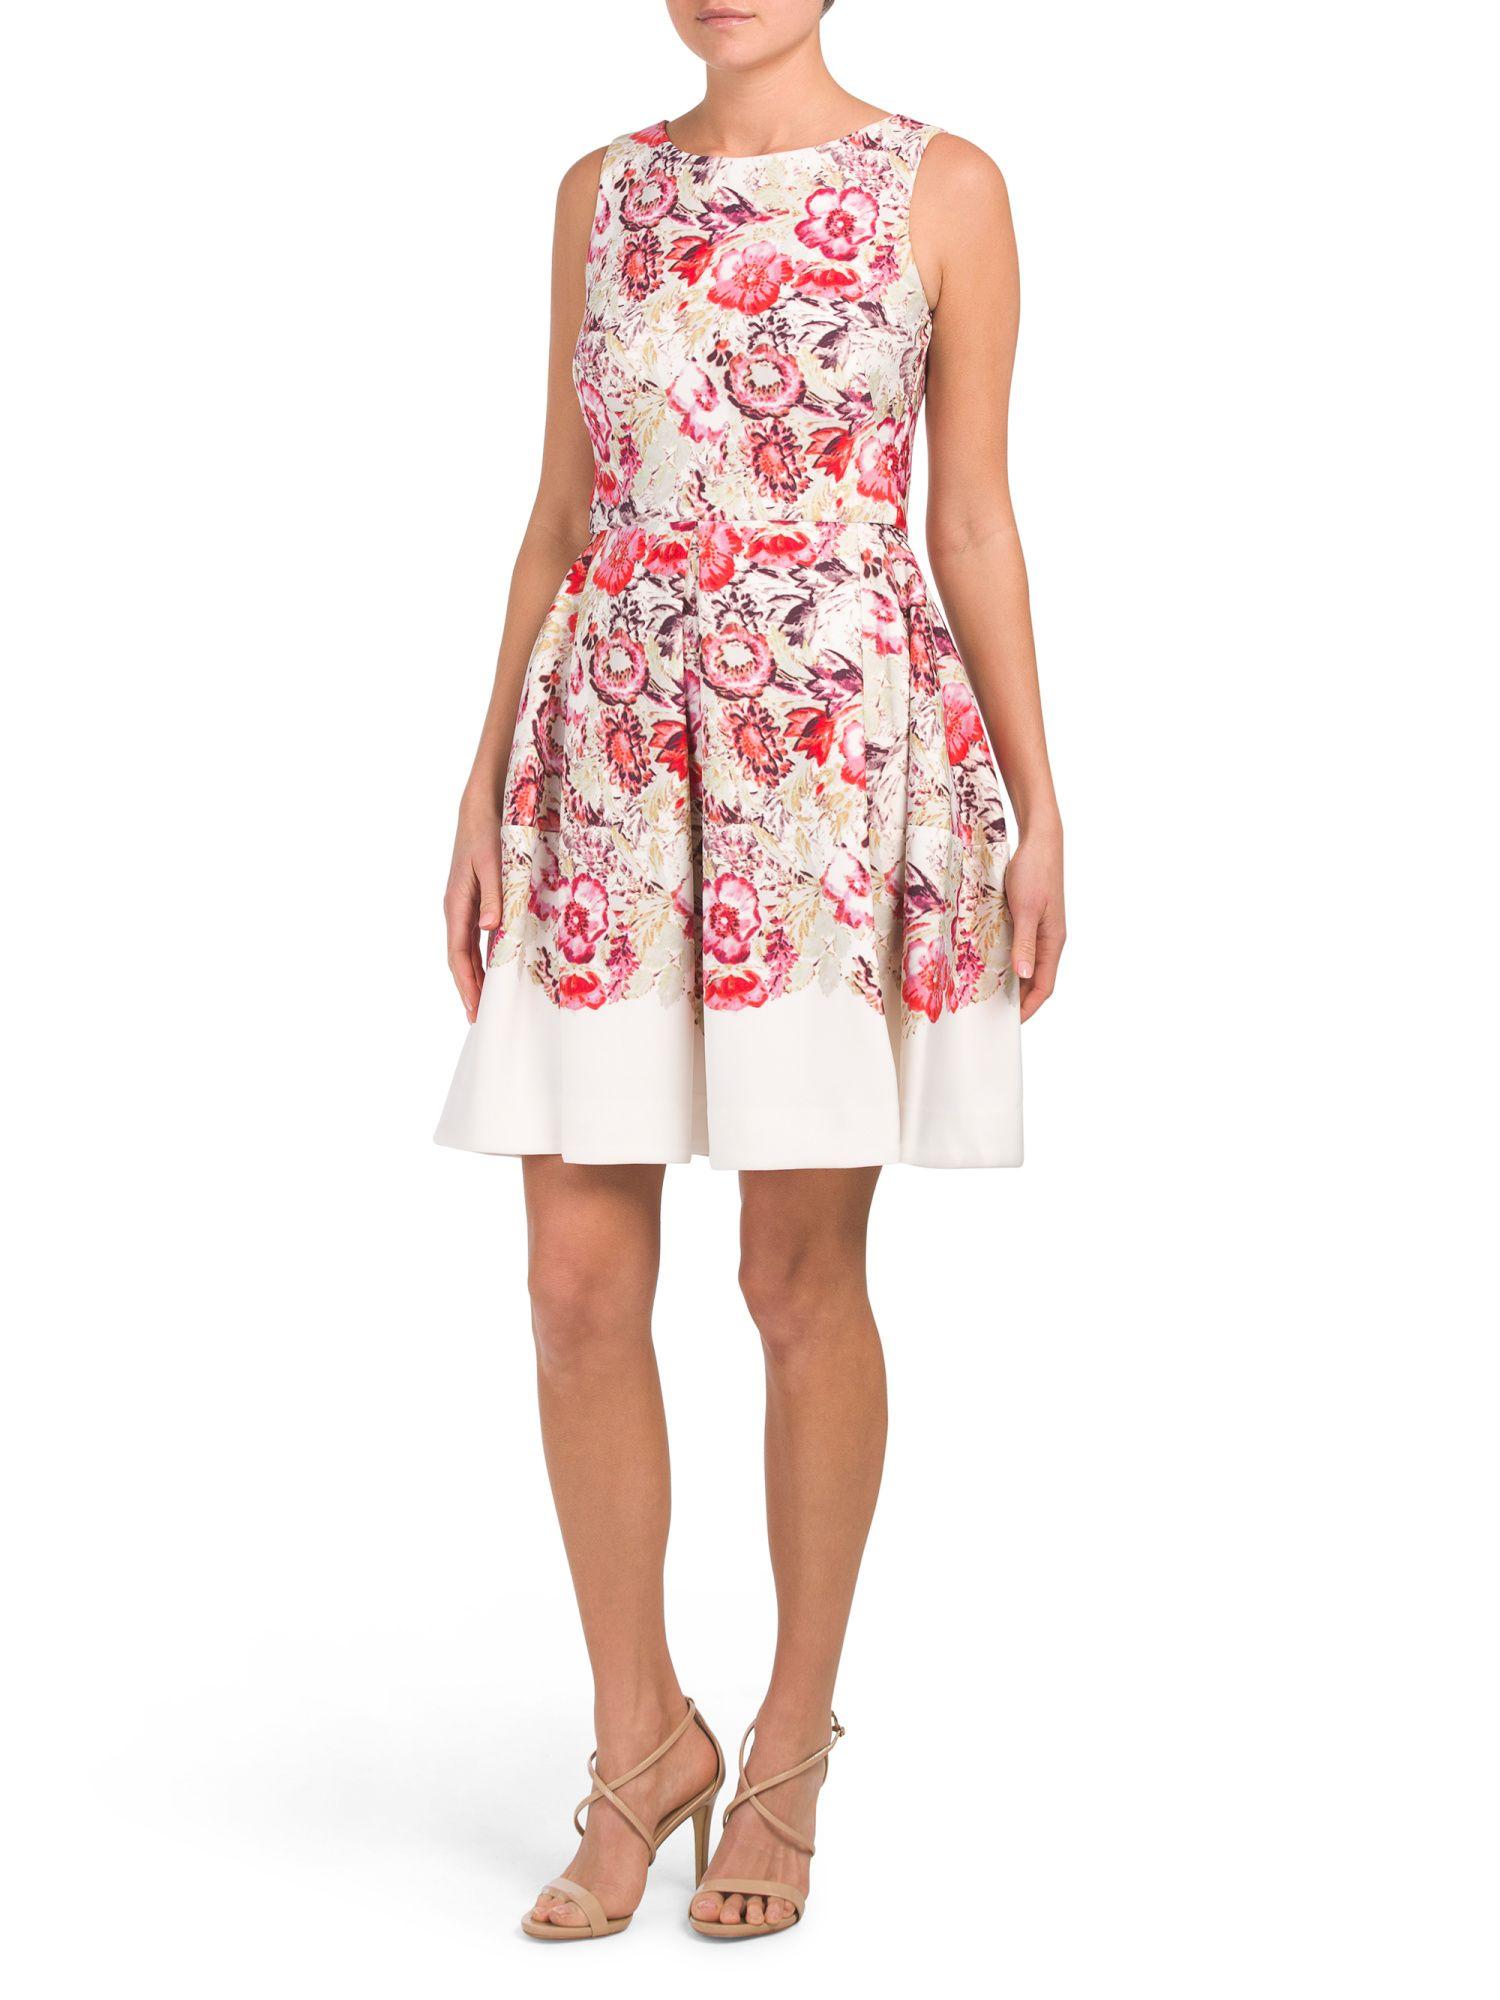 Floral Scuba Pleat Fit Flare Dress New Arrivals T J Maxx Flare Dress Fit Flare Dress Dresses [ 2000 x 1500 Pixel ]